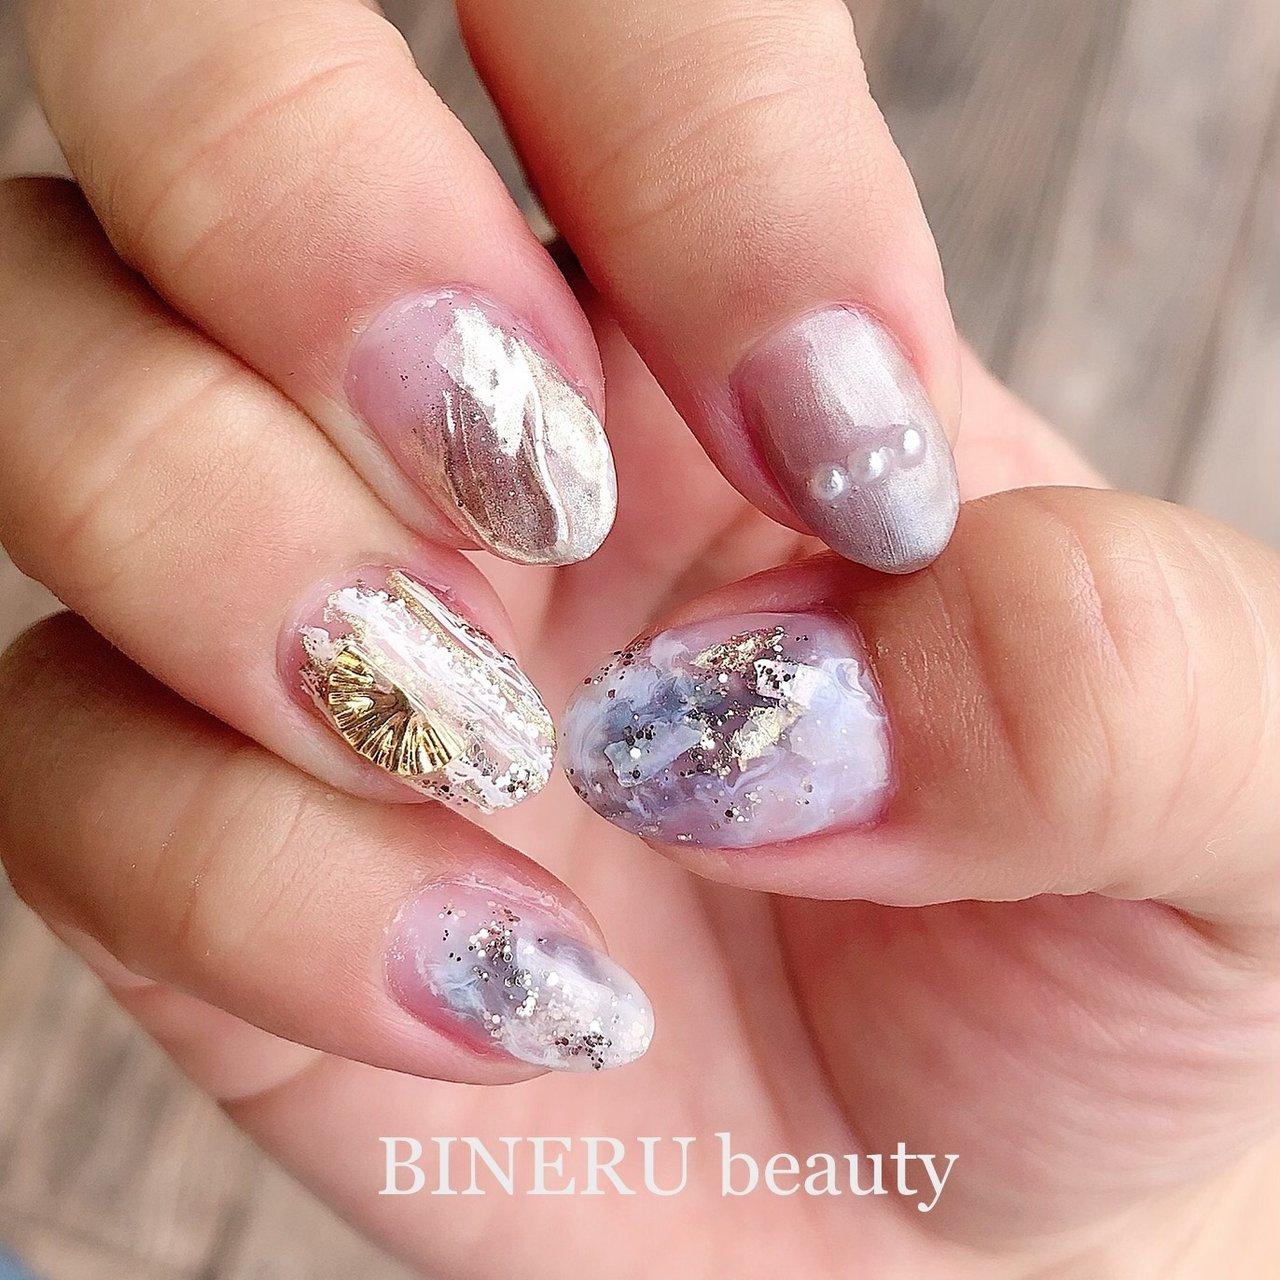 MY nail❤️ #梅雨ネイル #ニュアンスネイル #ミラーネイル #BINERU beauty #静岡ネイルサロン #BINERU beauty #ネイルブック